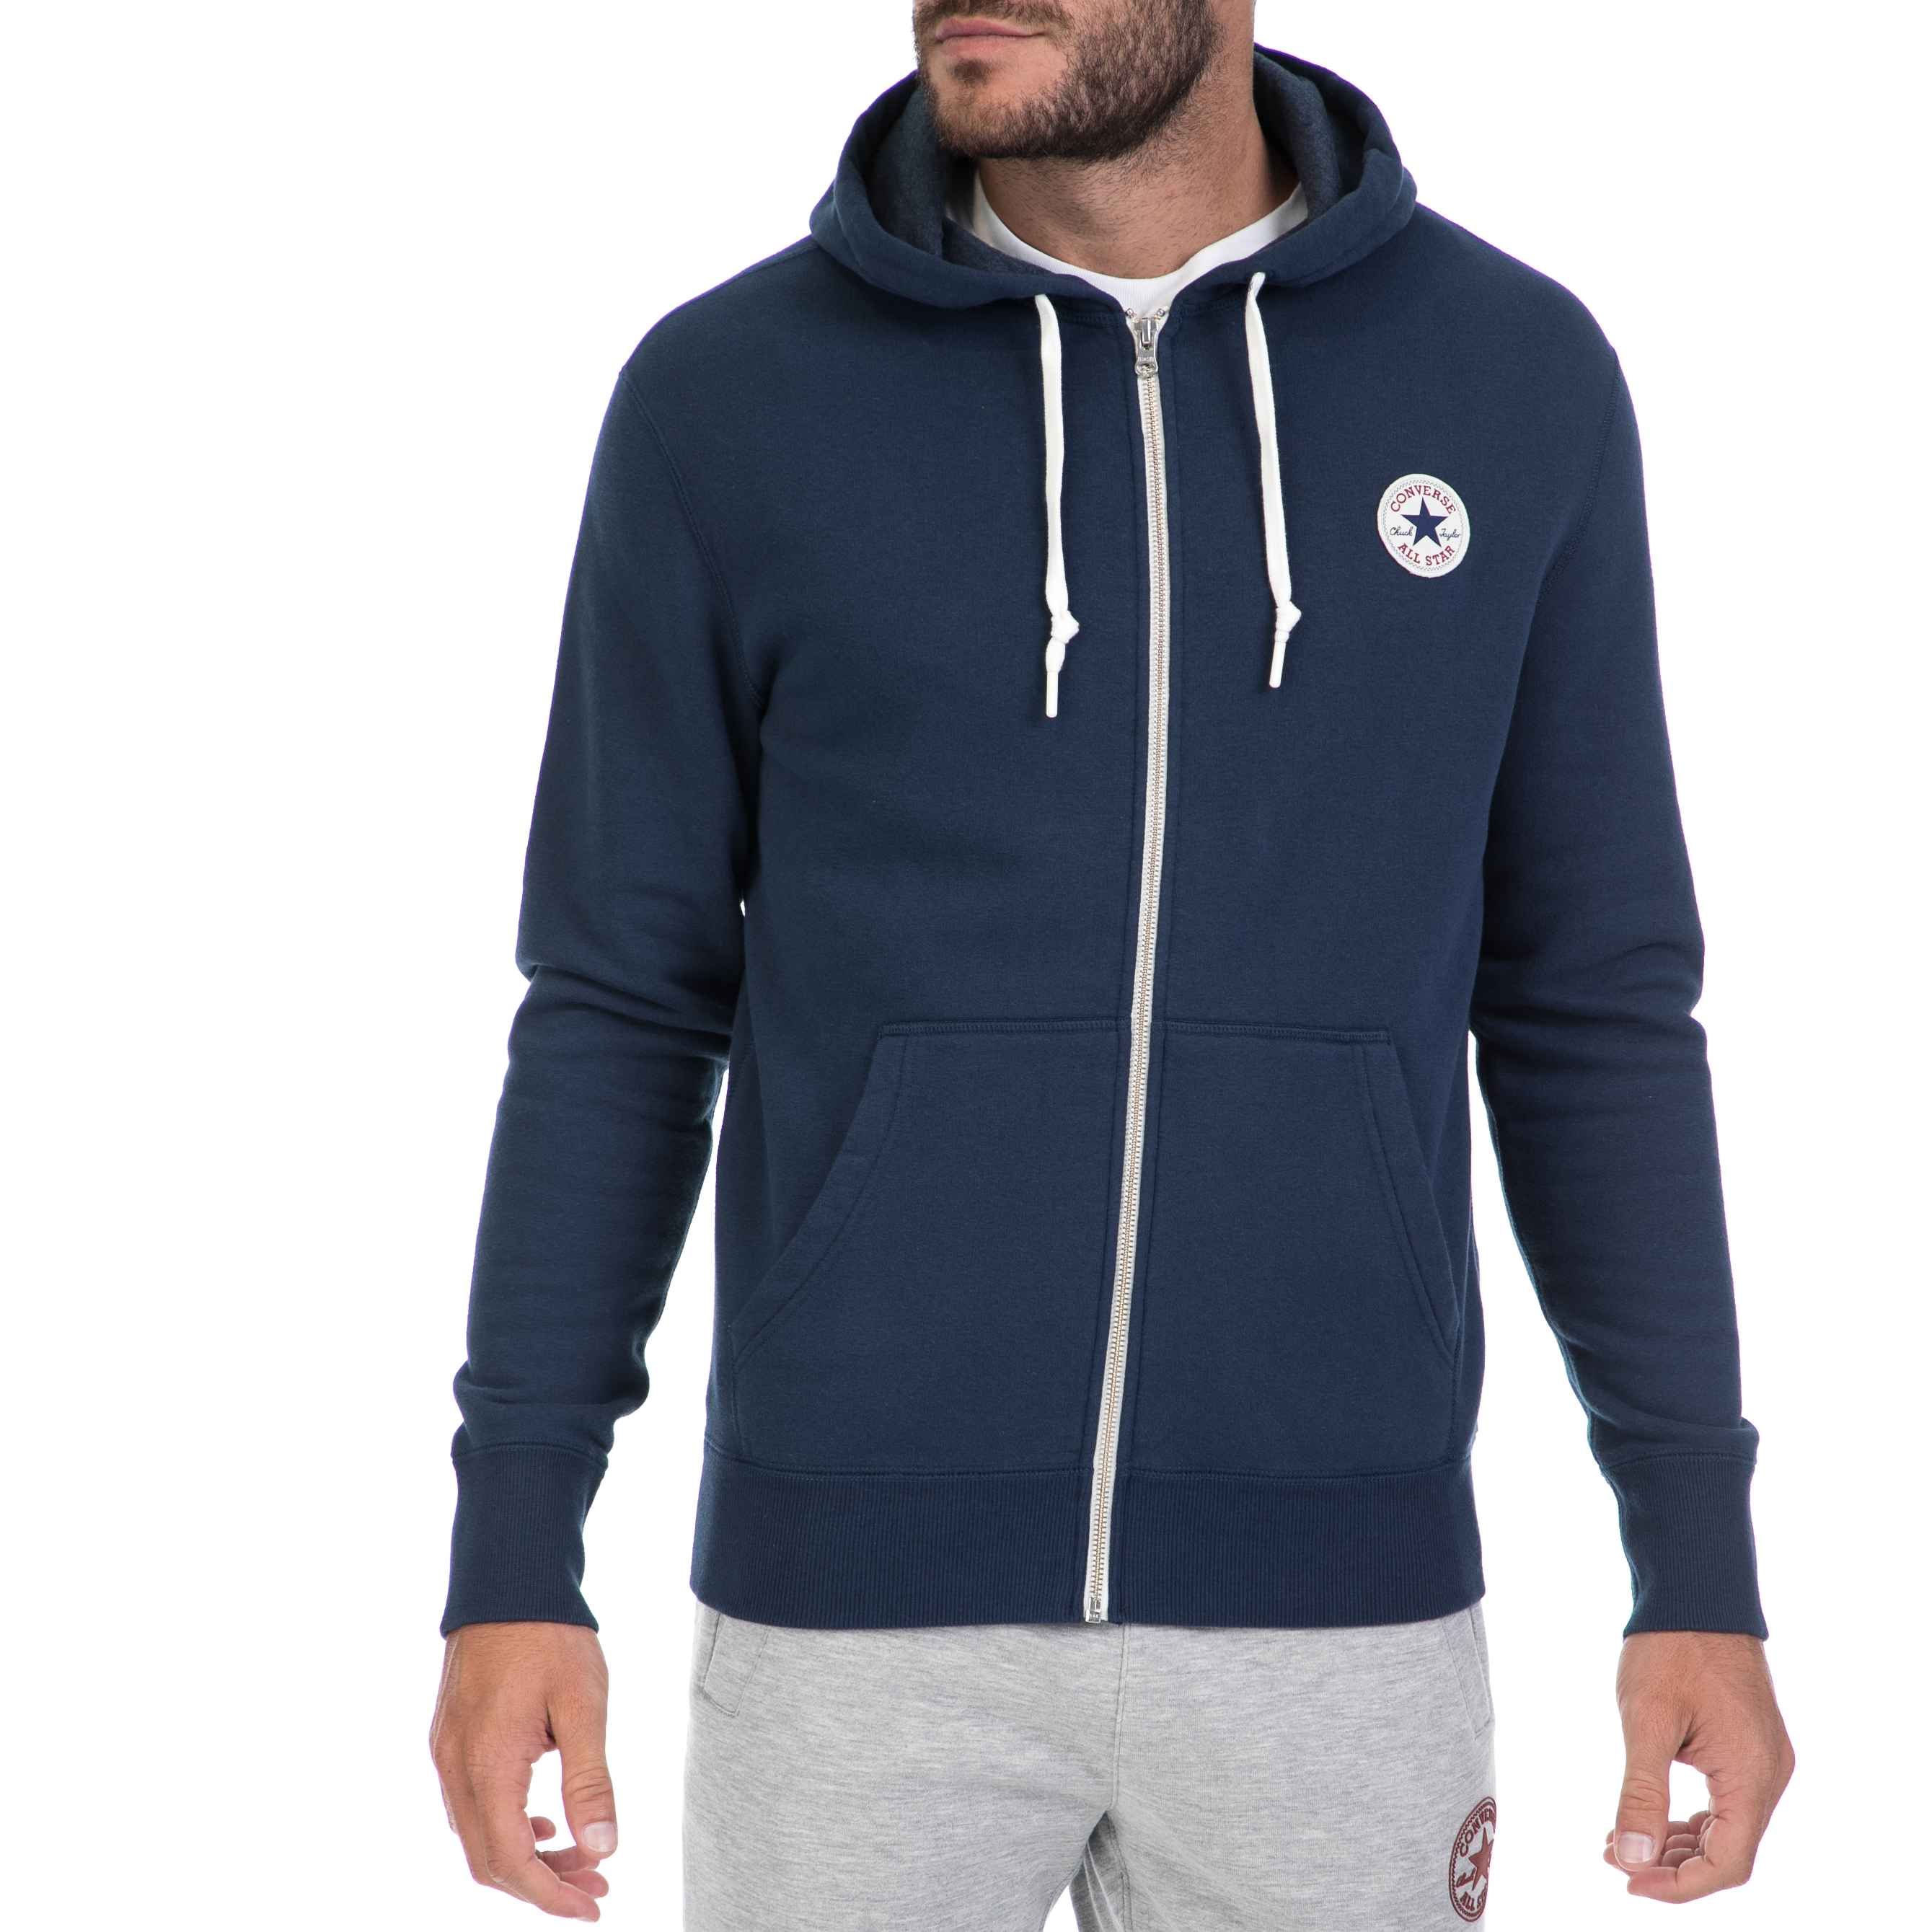 CONVERSE - Αντρική ζακέτα CONVERSE μπλε ανδρικά ρούχα αθλητικά φούτερ μακρυμάνικα